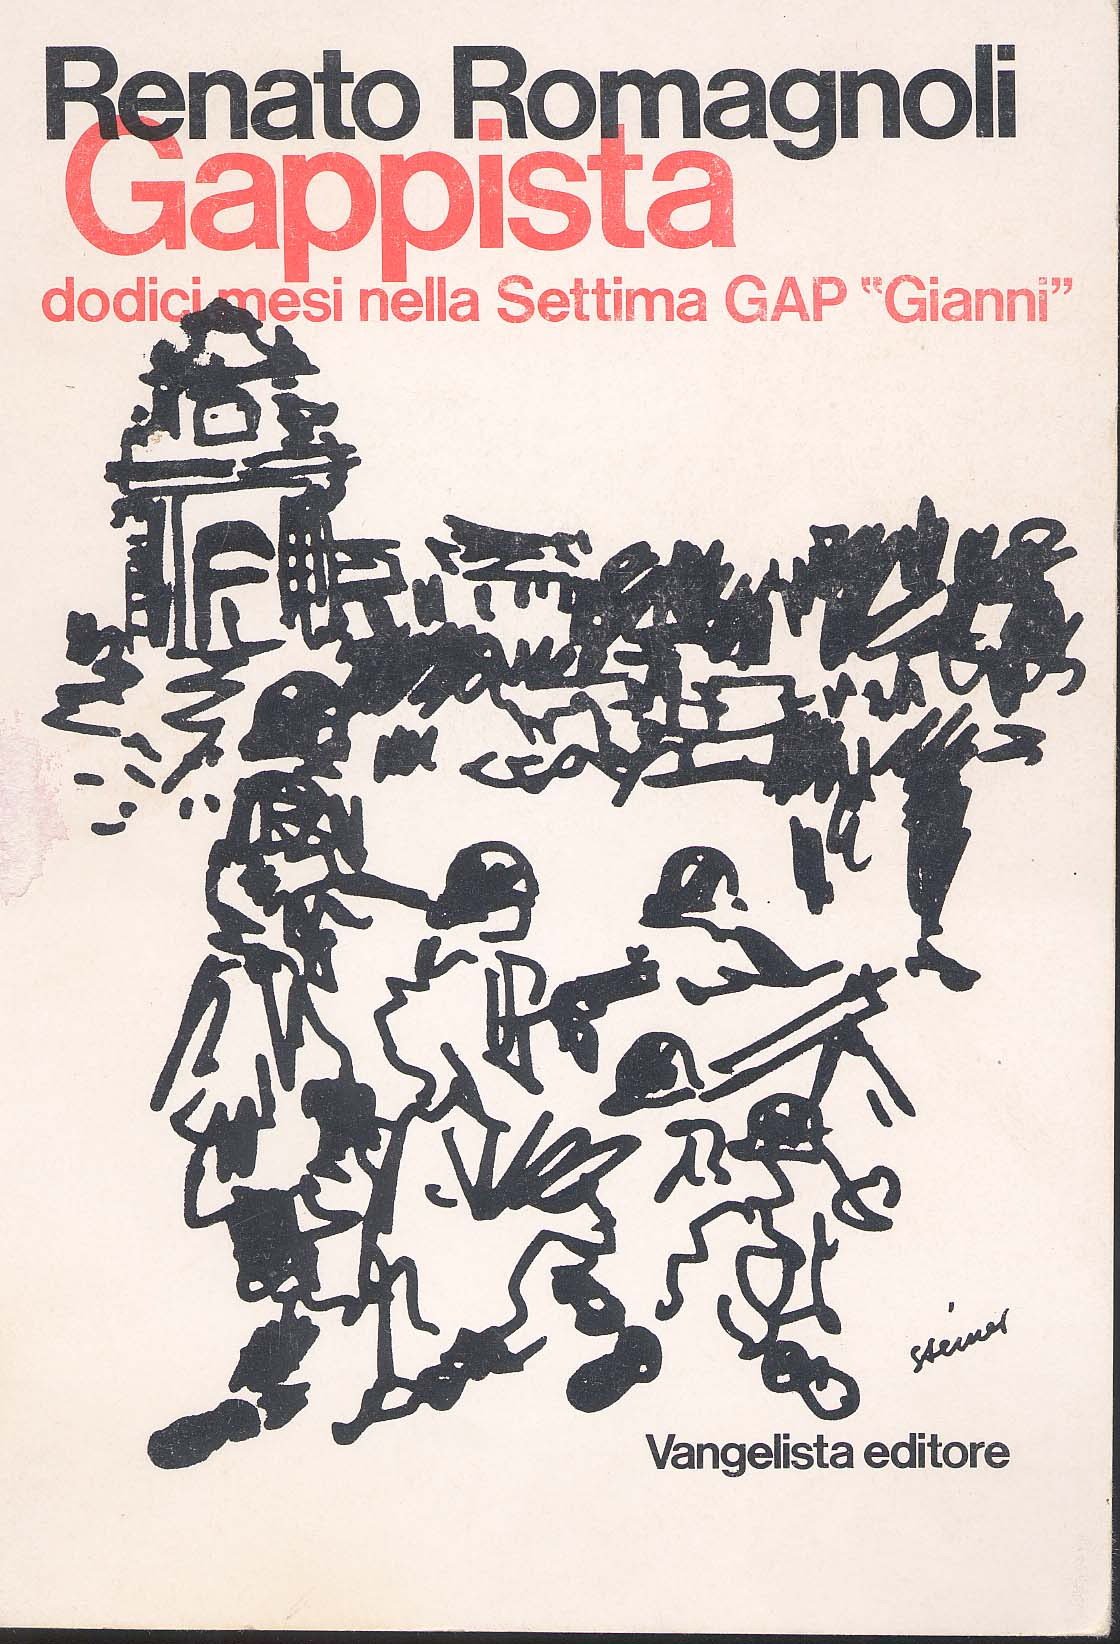 Gappista